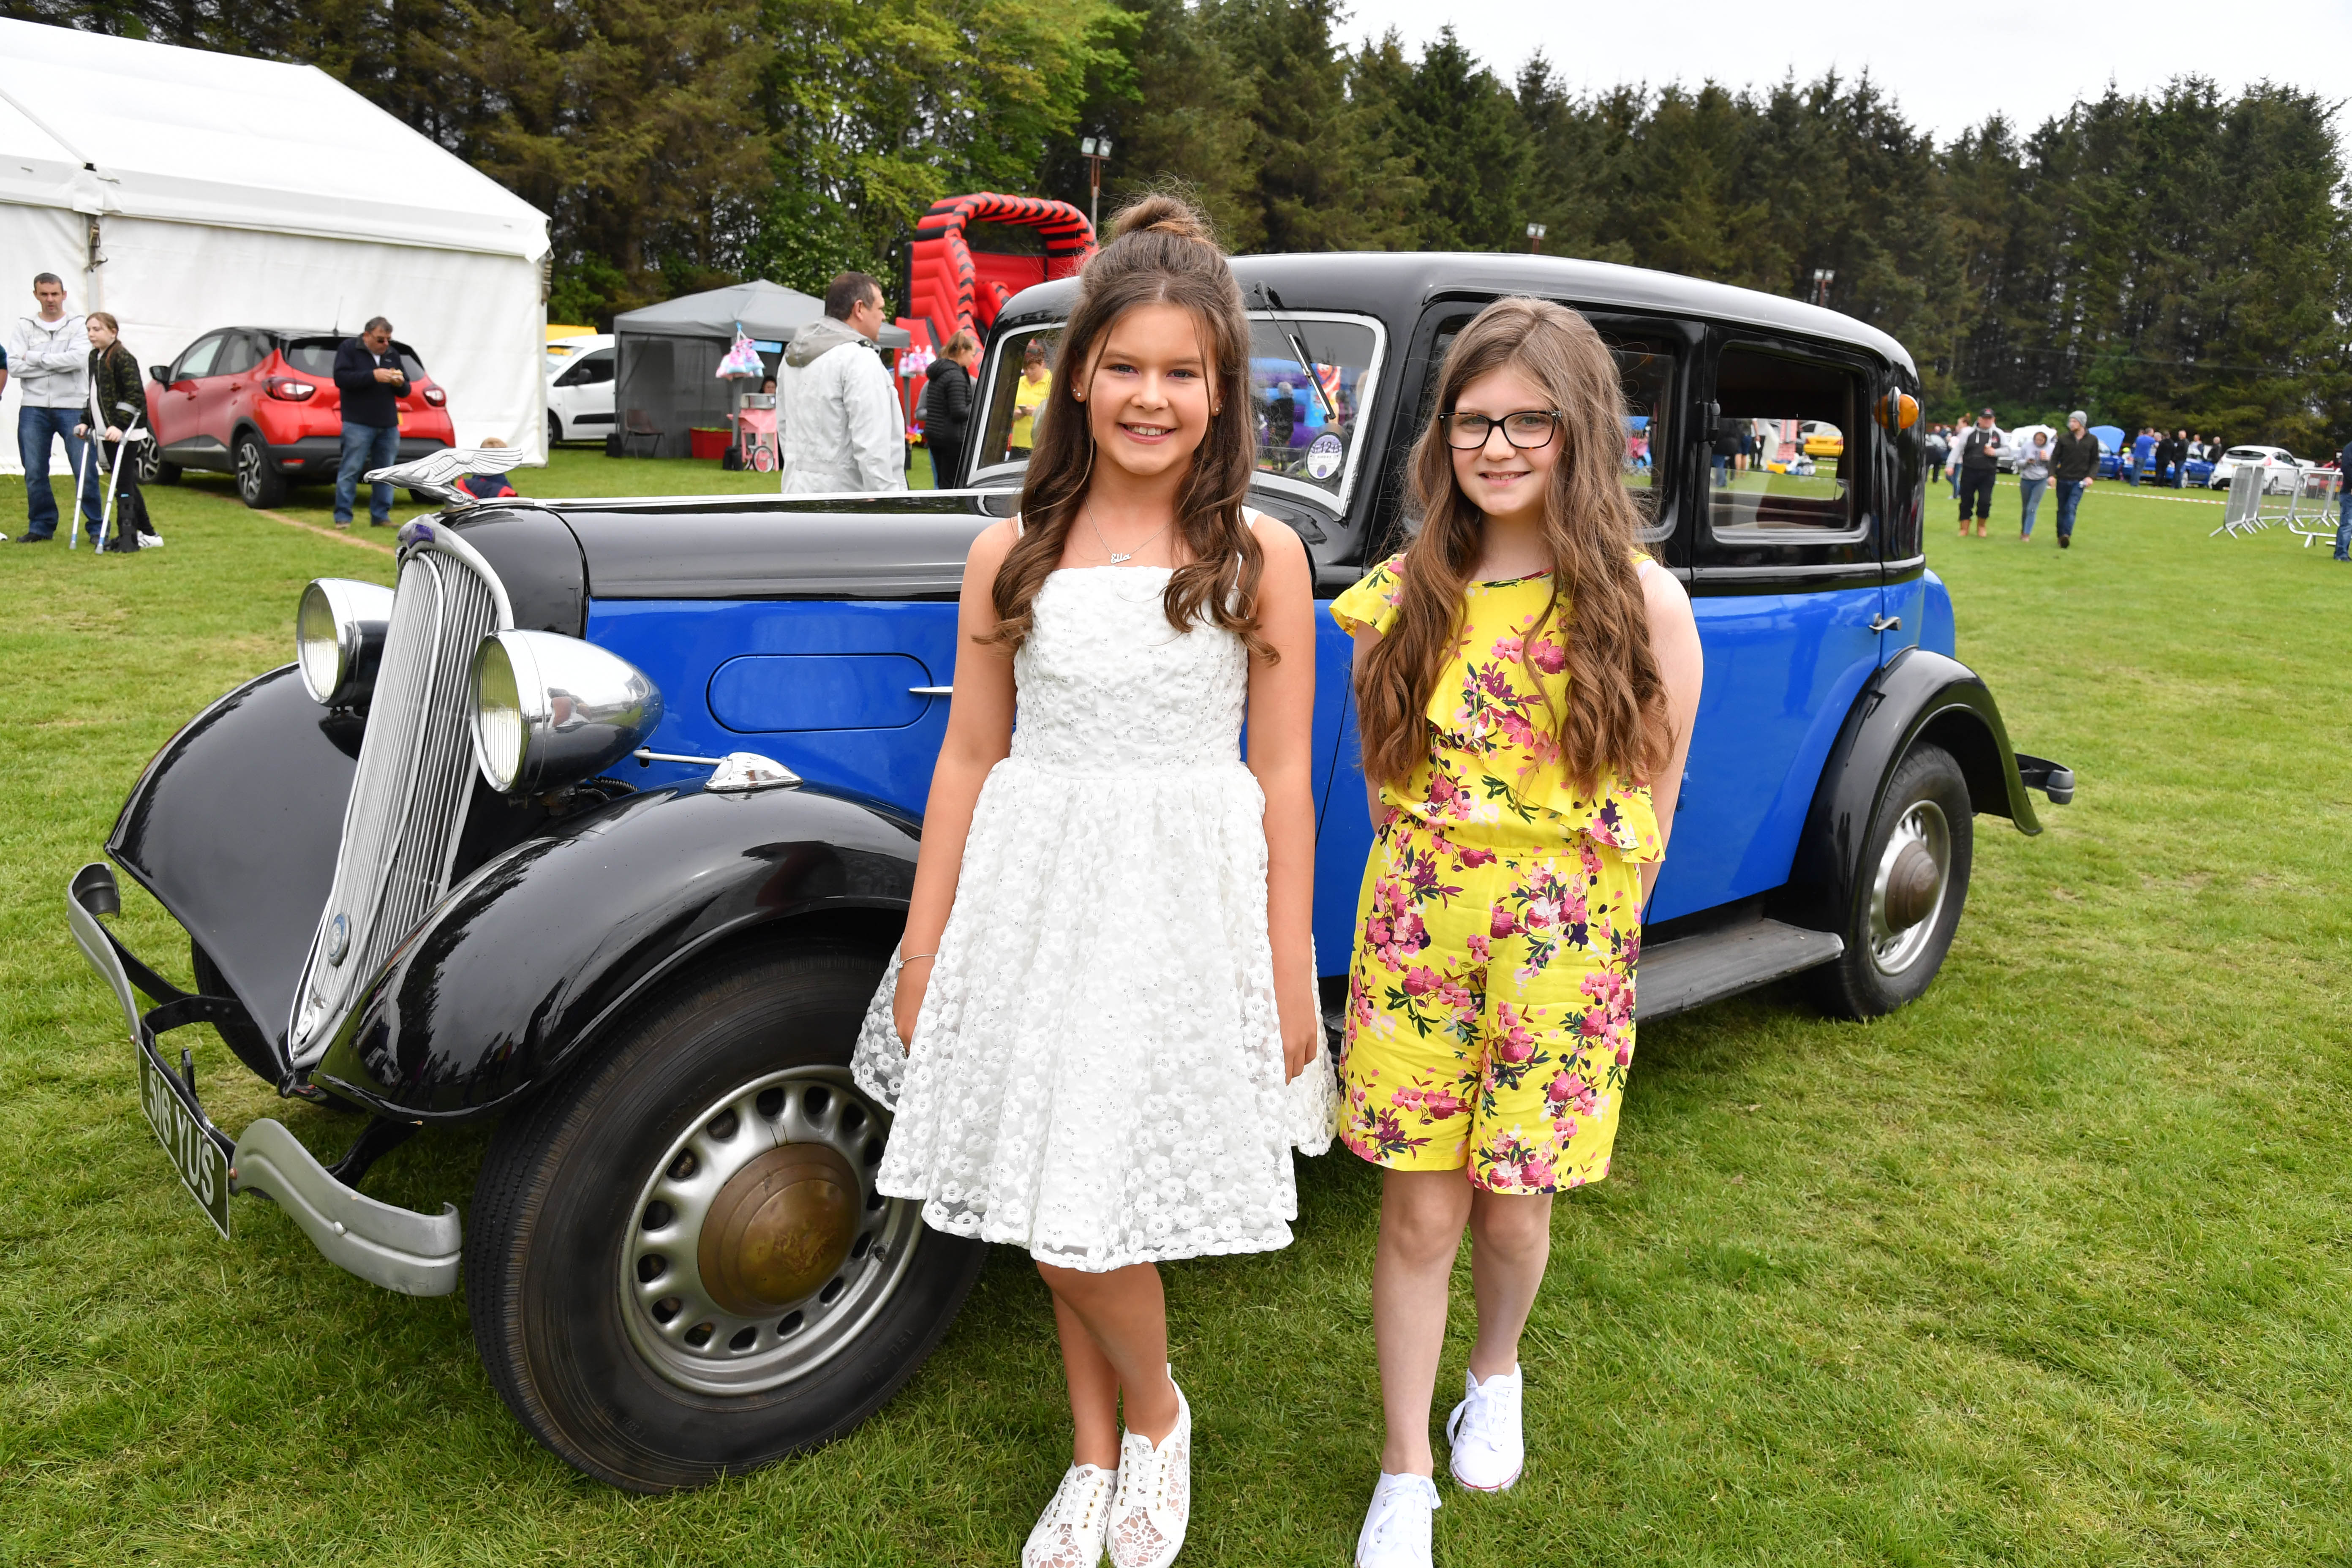 Gala princesses Ella Penny (left) and Alyssa Lamarsh at the gala